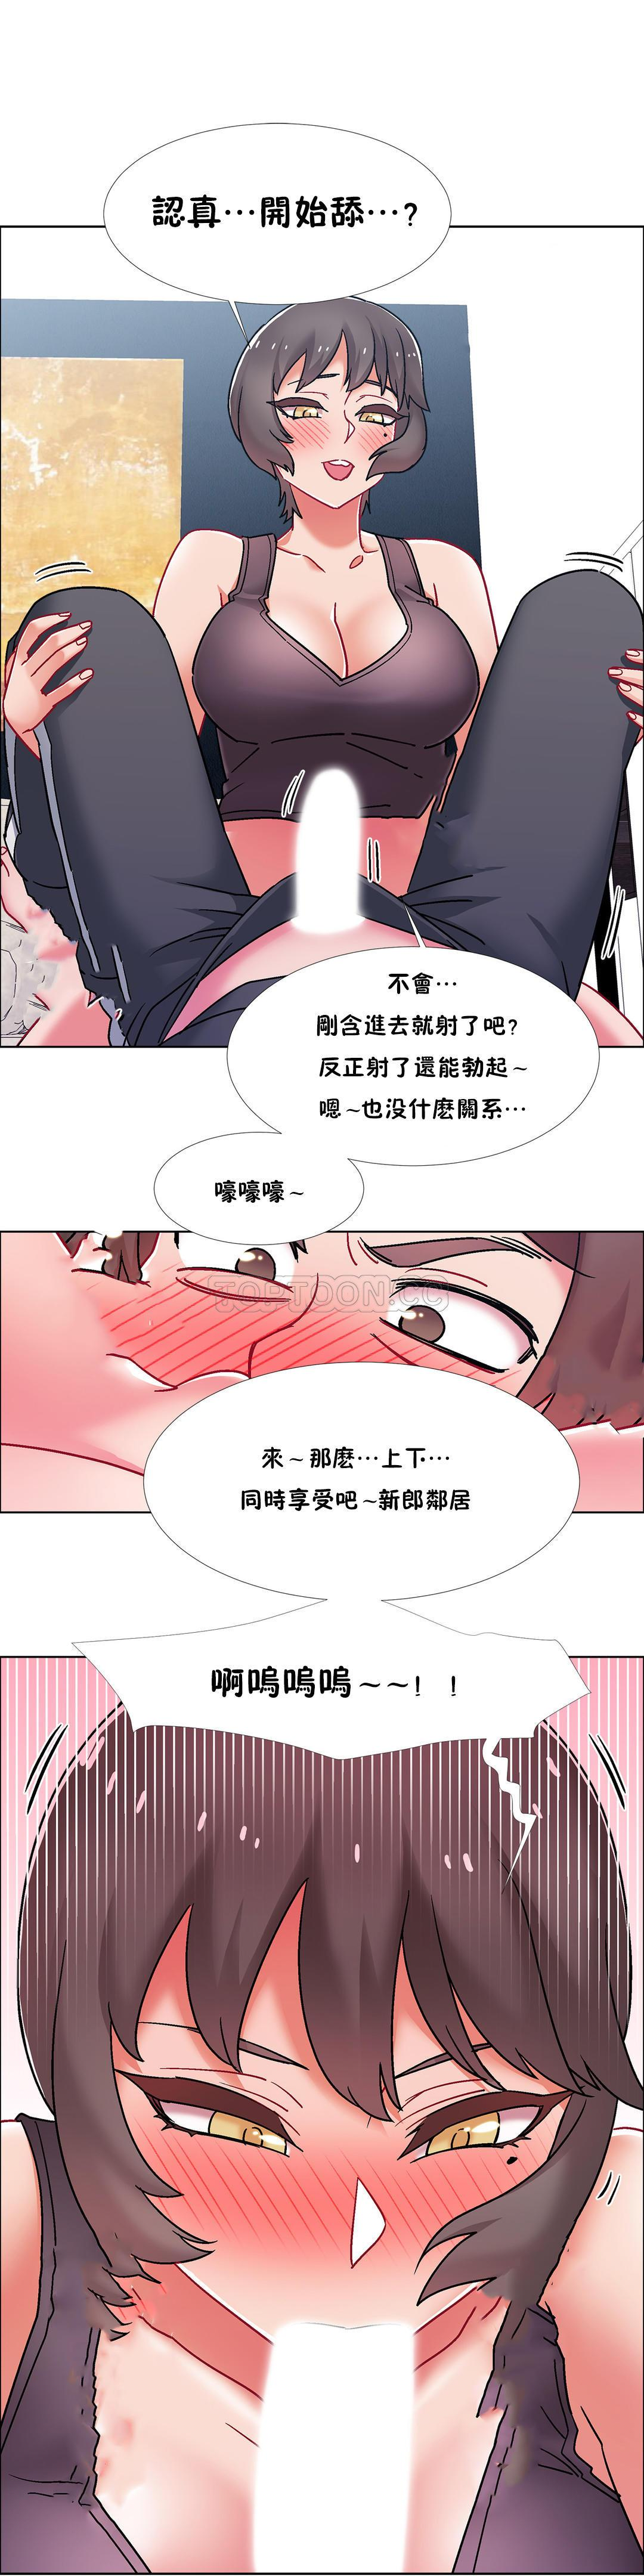 [Studio Wannabe] Rental Girls | 出租女郎 Ch. 33-58 [Chinese]  第二季 完结 352